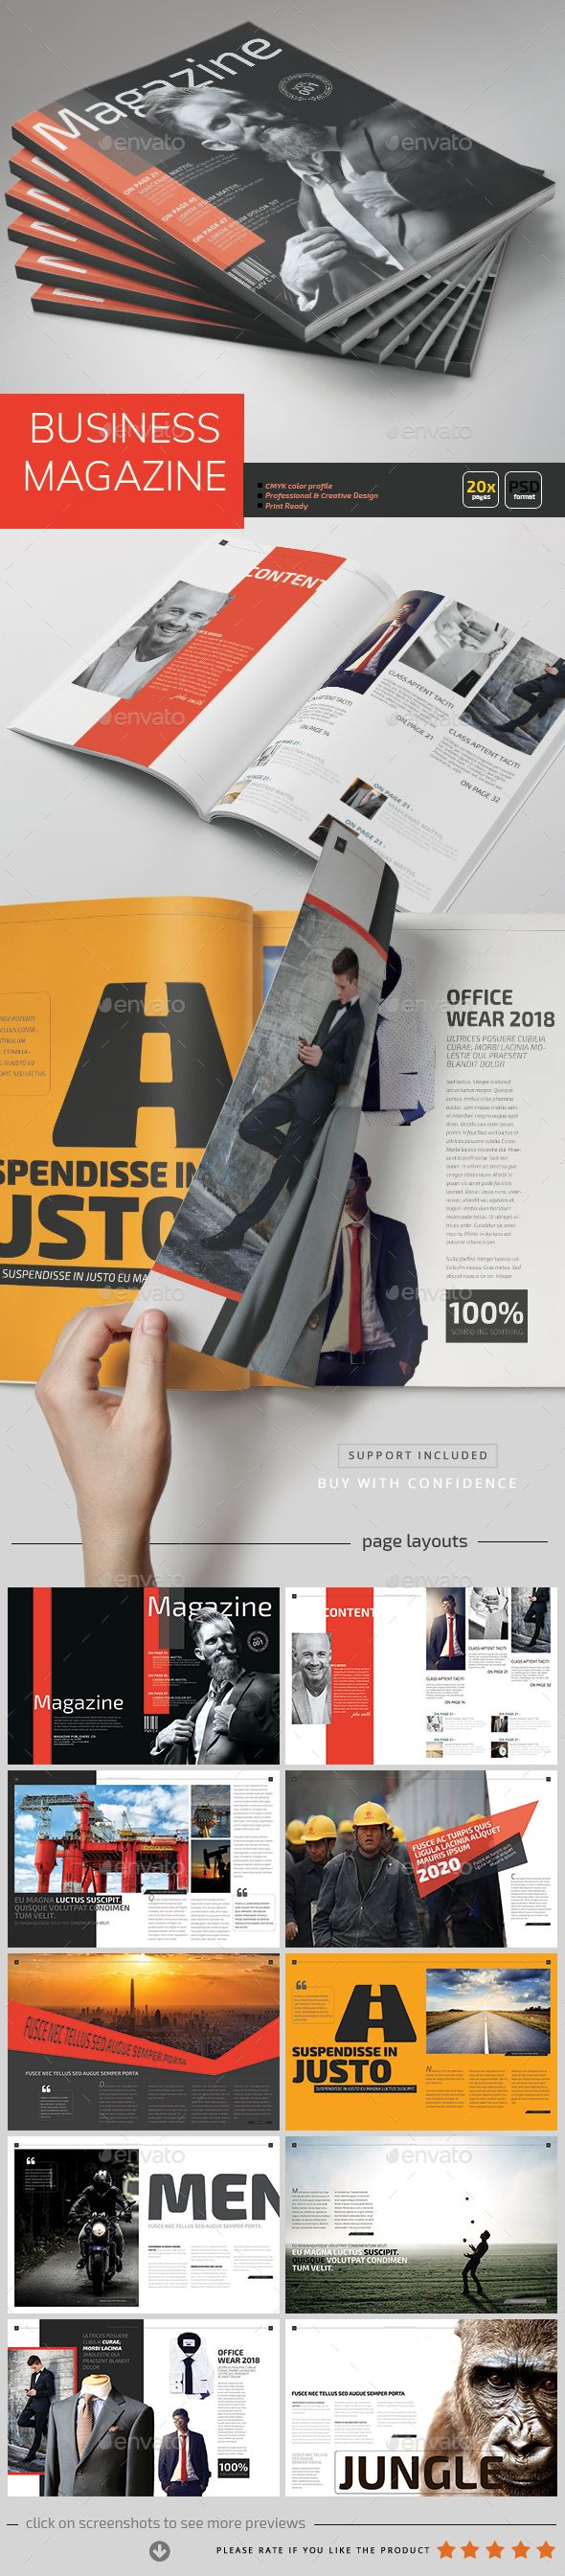 Business Magazine Template - PSD | Diario y Revistas